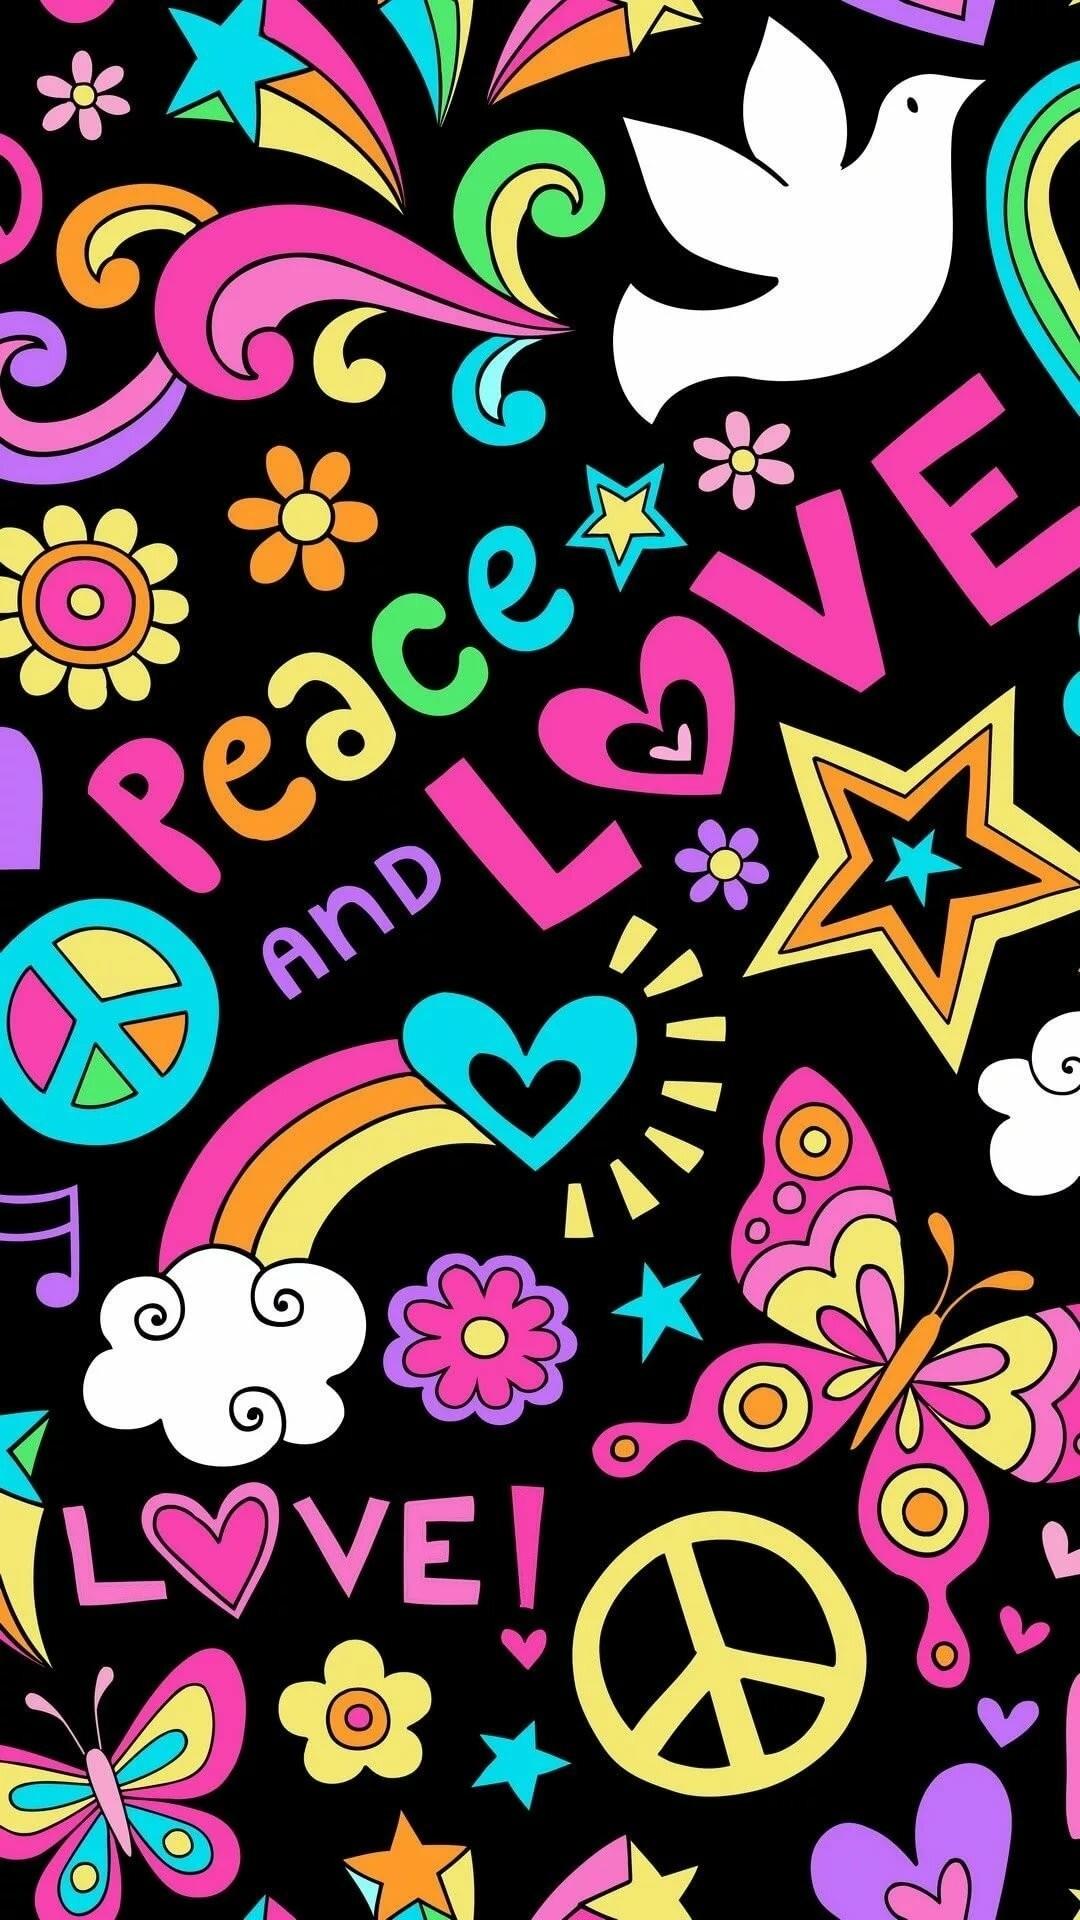 Hippie hd wallpaper